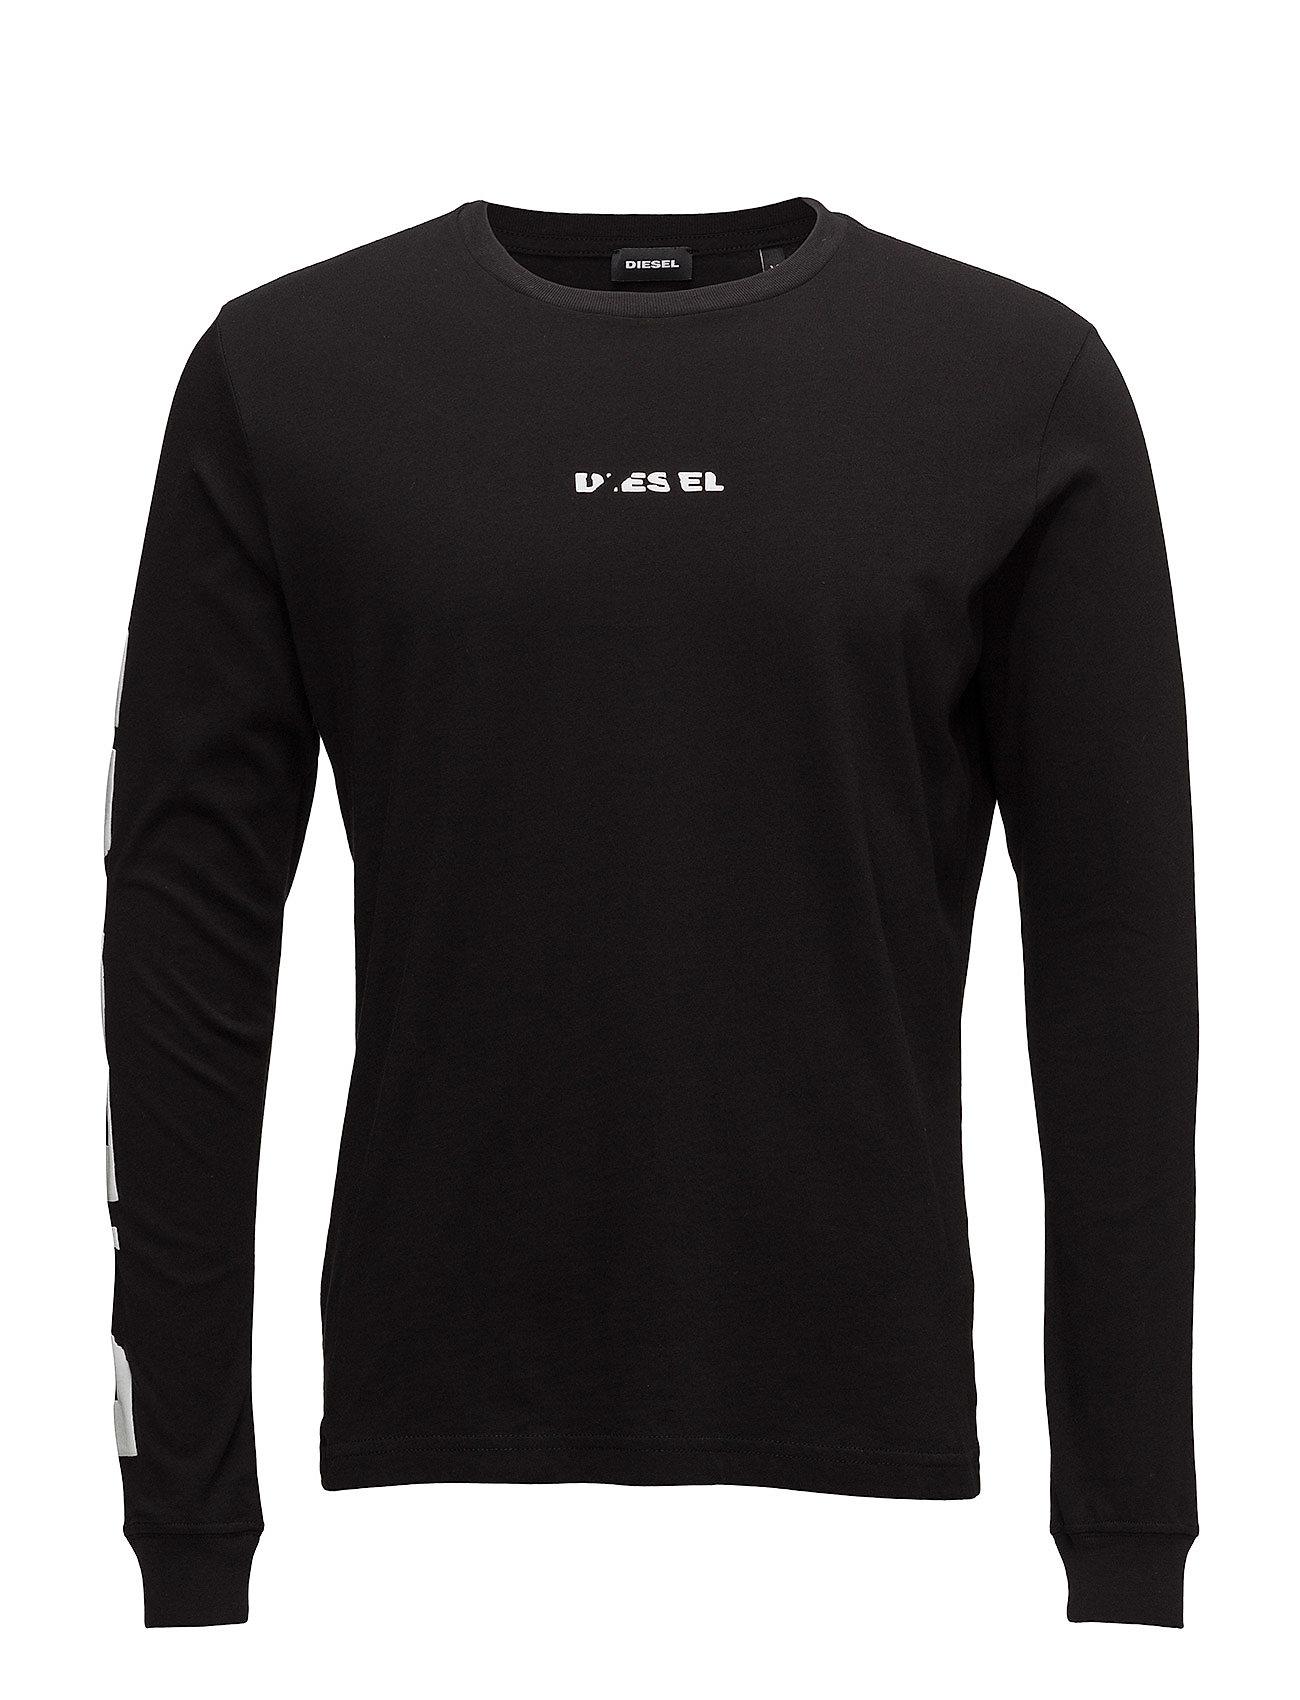 T-Joe-Ls-Sn T-Shirt - Diesel Men